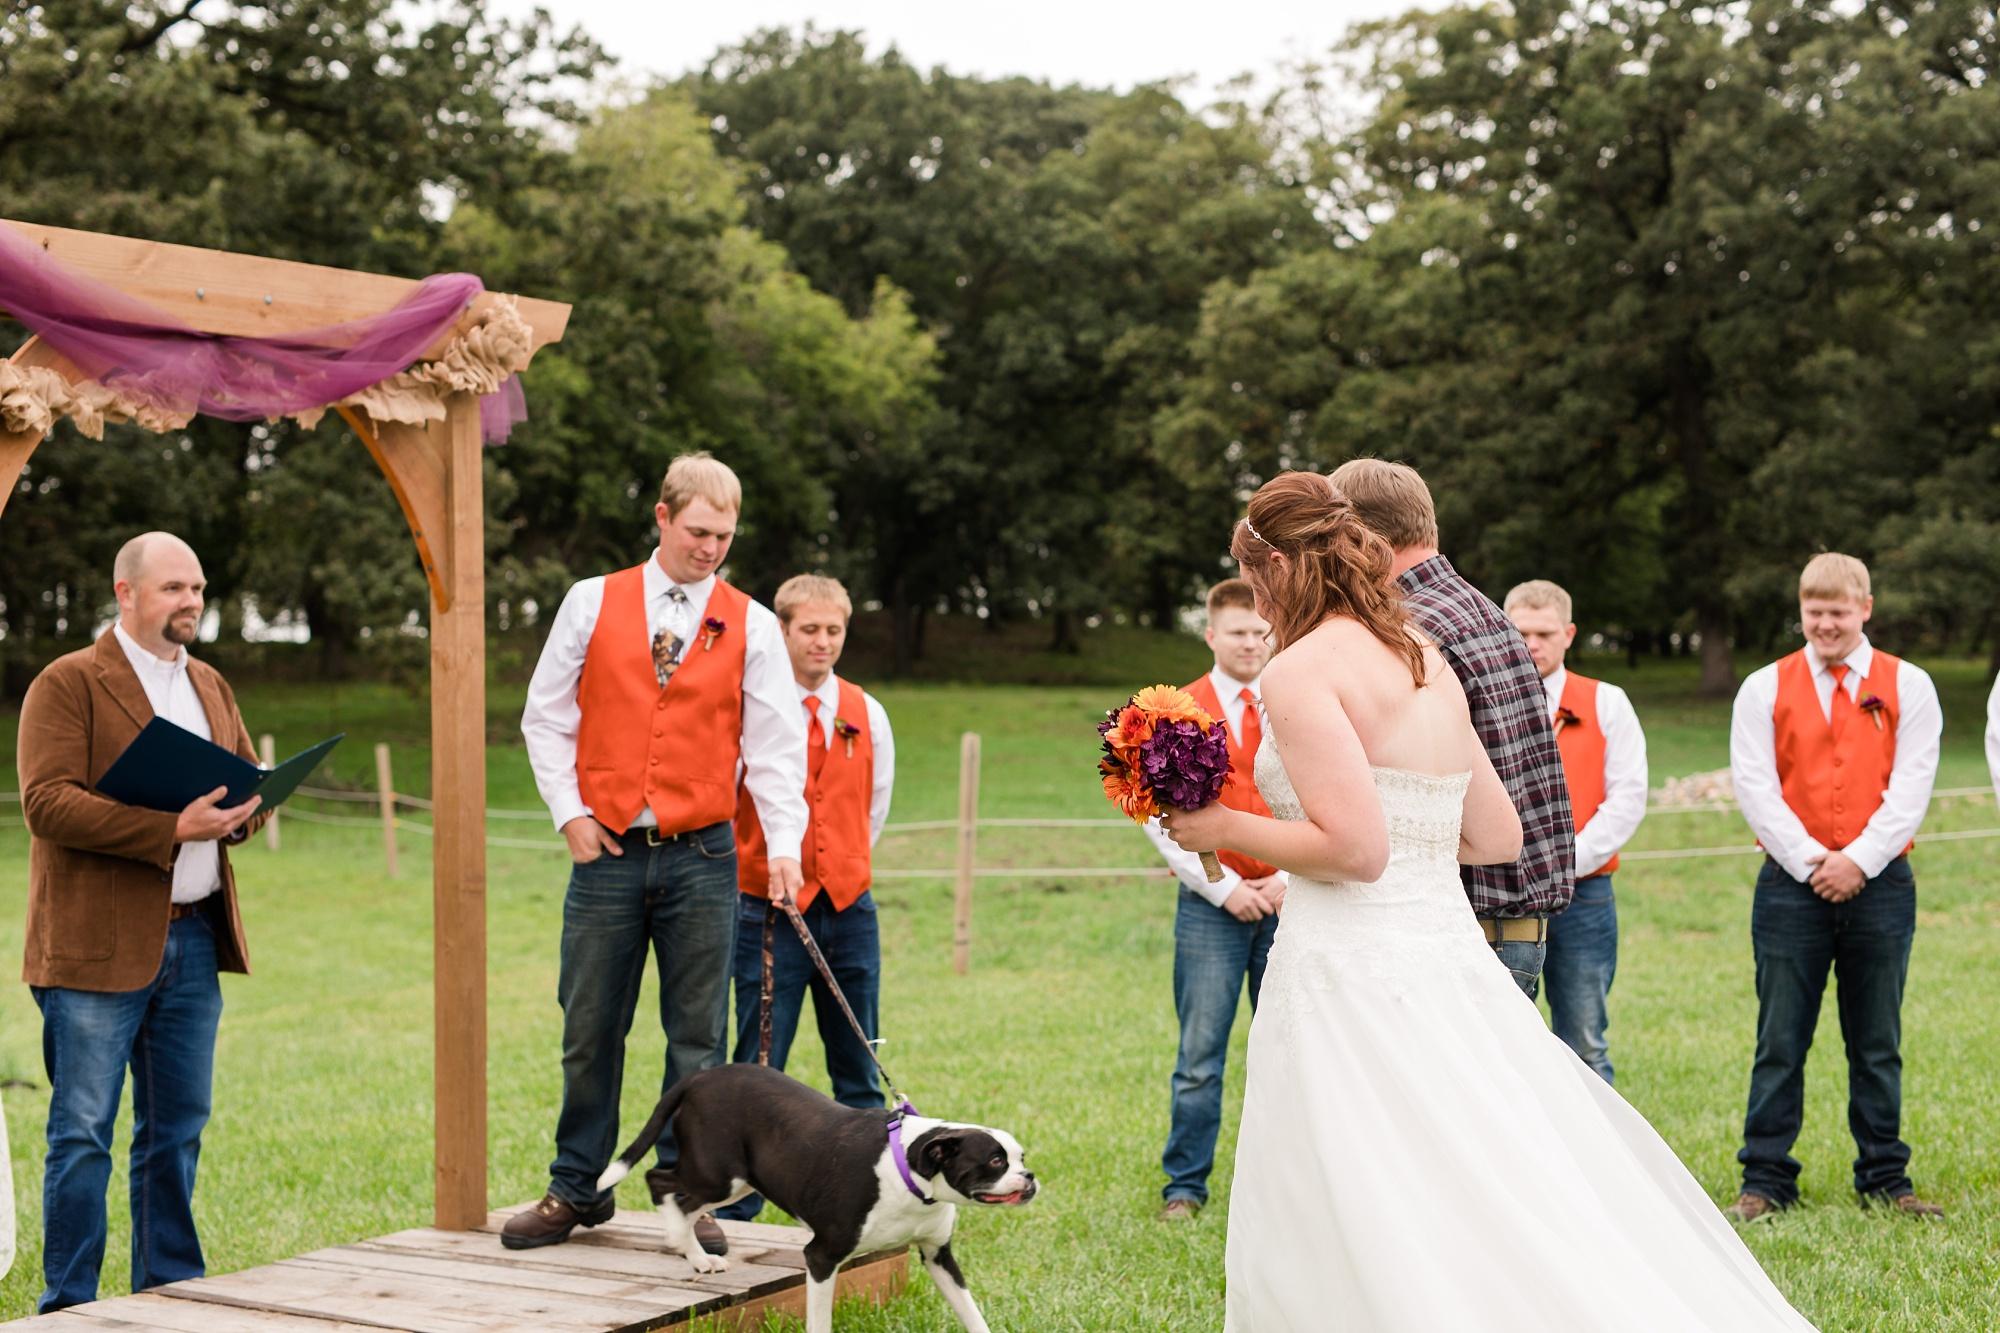 Amber Langerud_Lake Park MN Barn wedding at the Hitching Post_0443.jpg